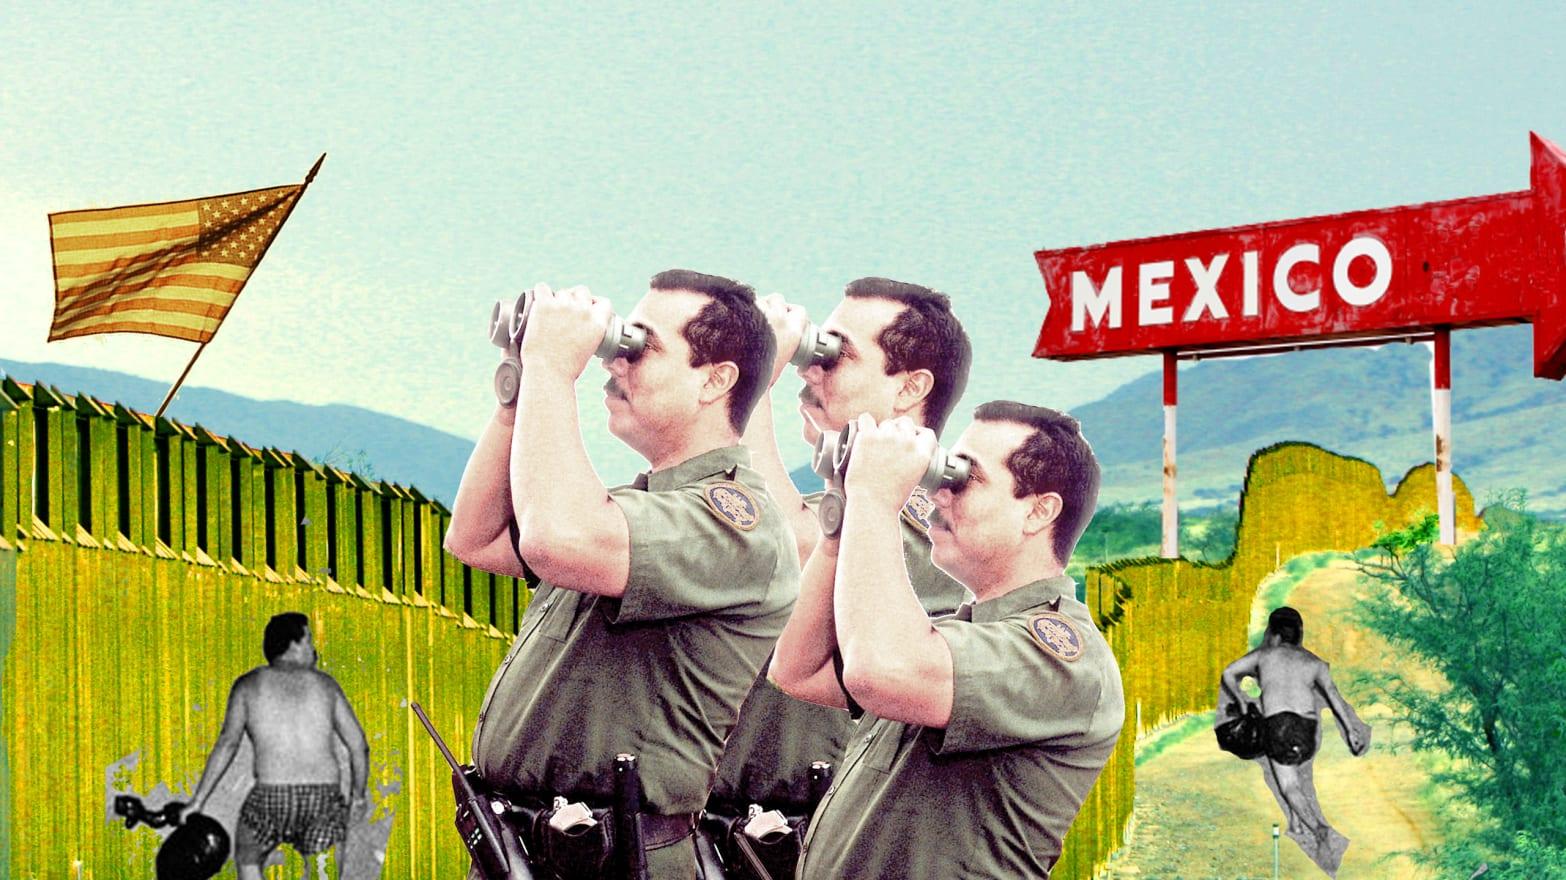 U S  Visas Helped Fuel the Juarez Drug Wars